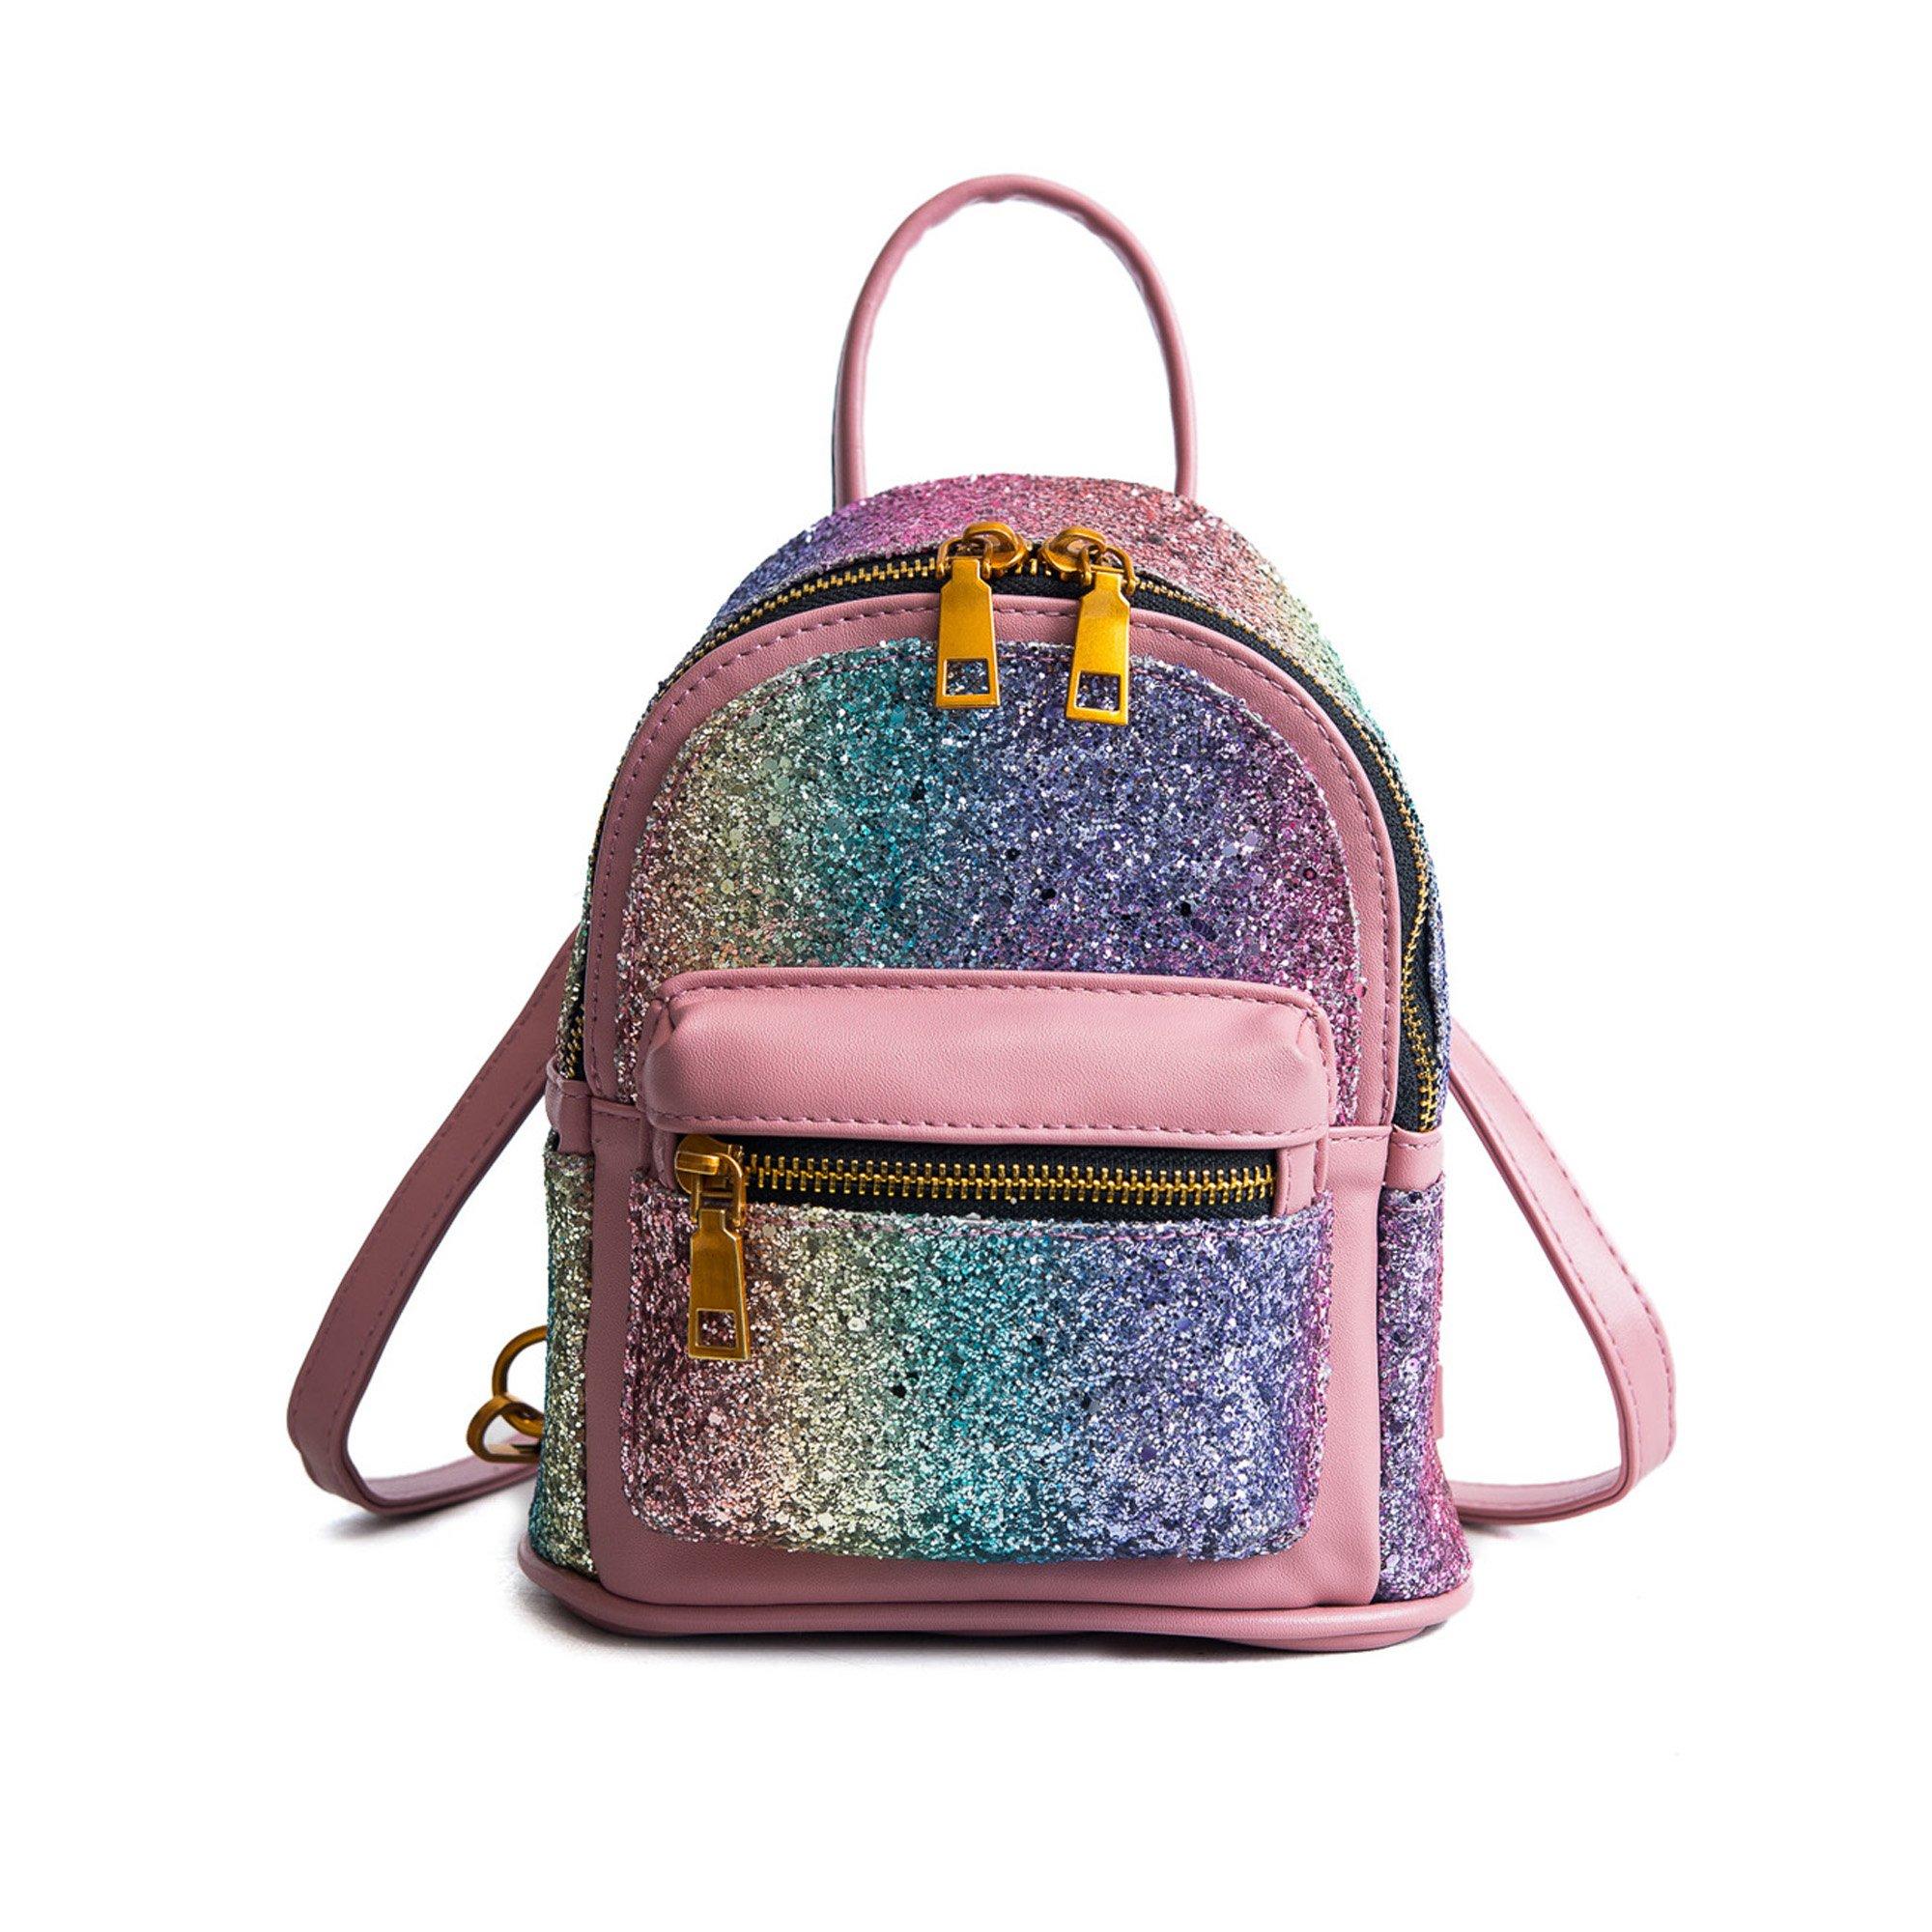 Girls Bling Mini Travel Backpack Kids Children School Bags Satchel Purses Daypack (pink rainbow) by JIANBAO (Image #1)